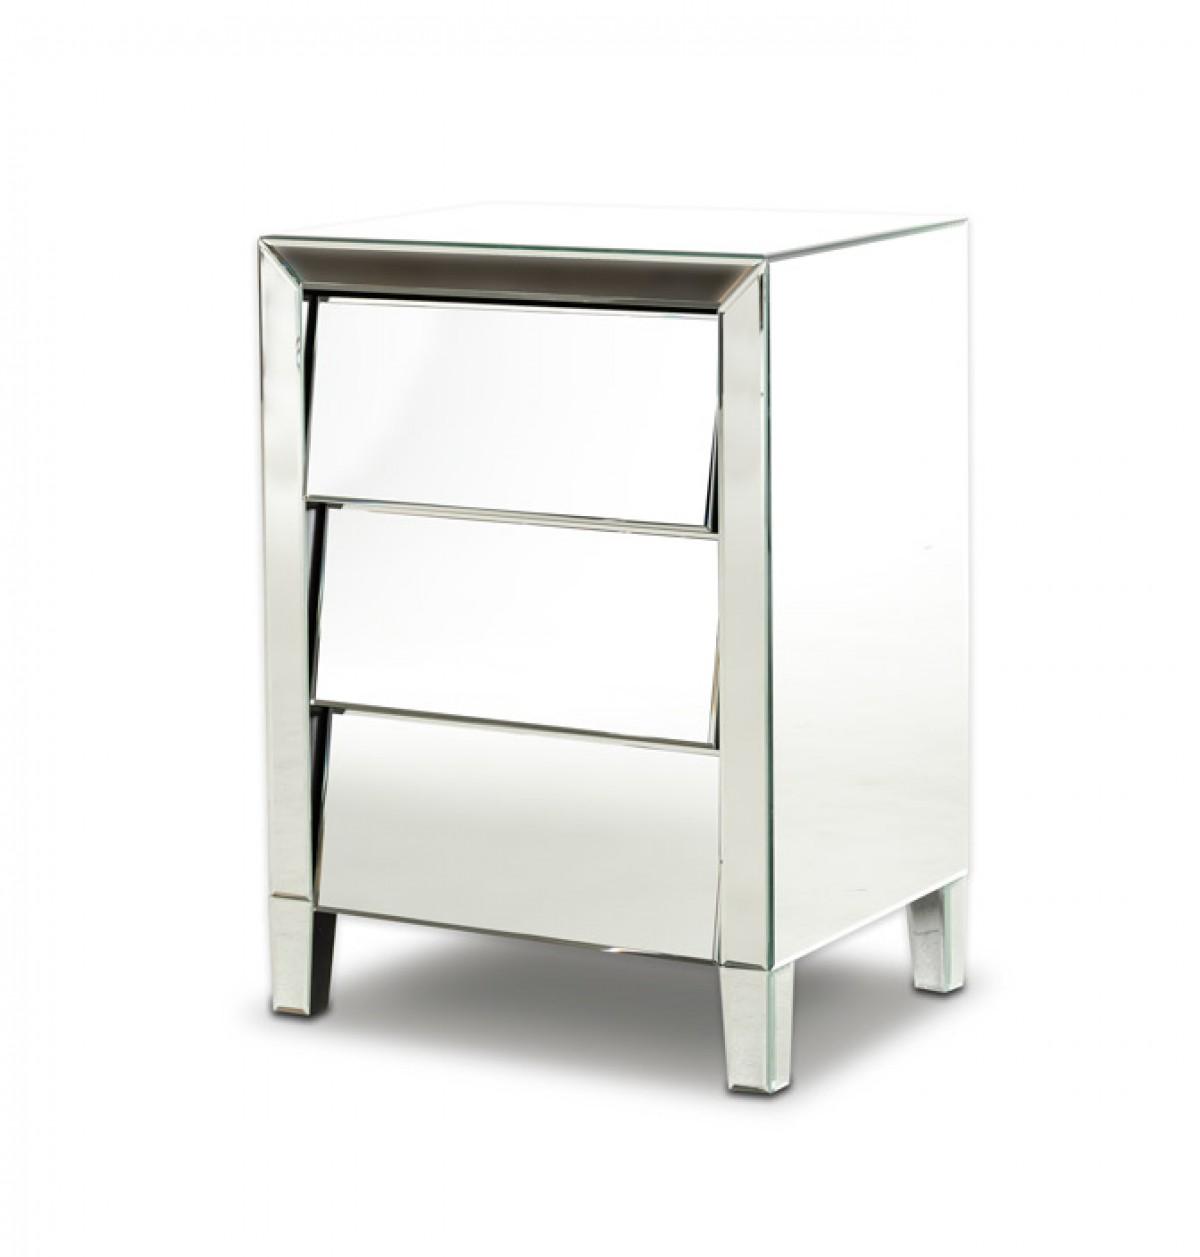 Modrest roanoke modern mirrored bedroom furniture for Mirrored bedroom furniture